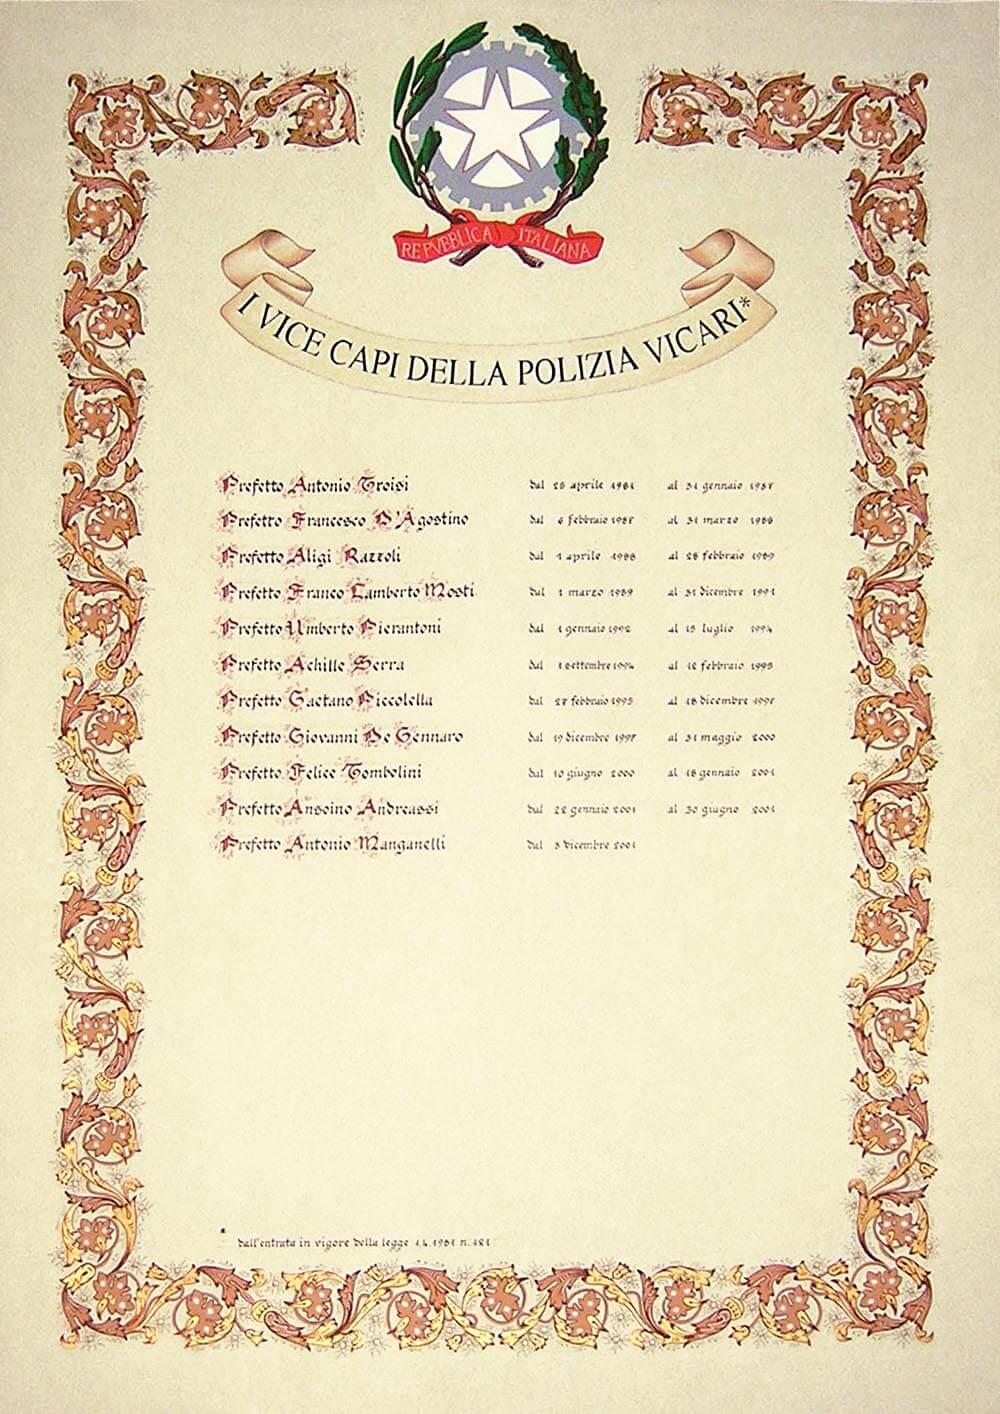 Pergamena lista incarichi costituzionali